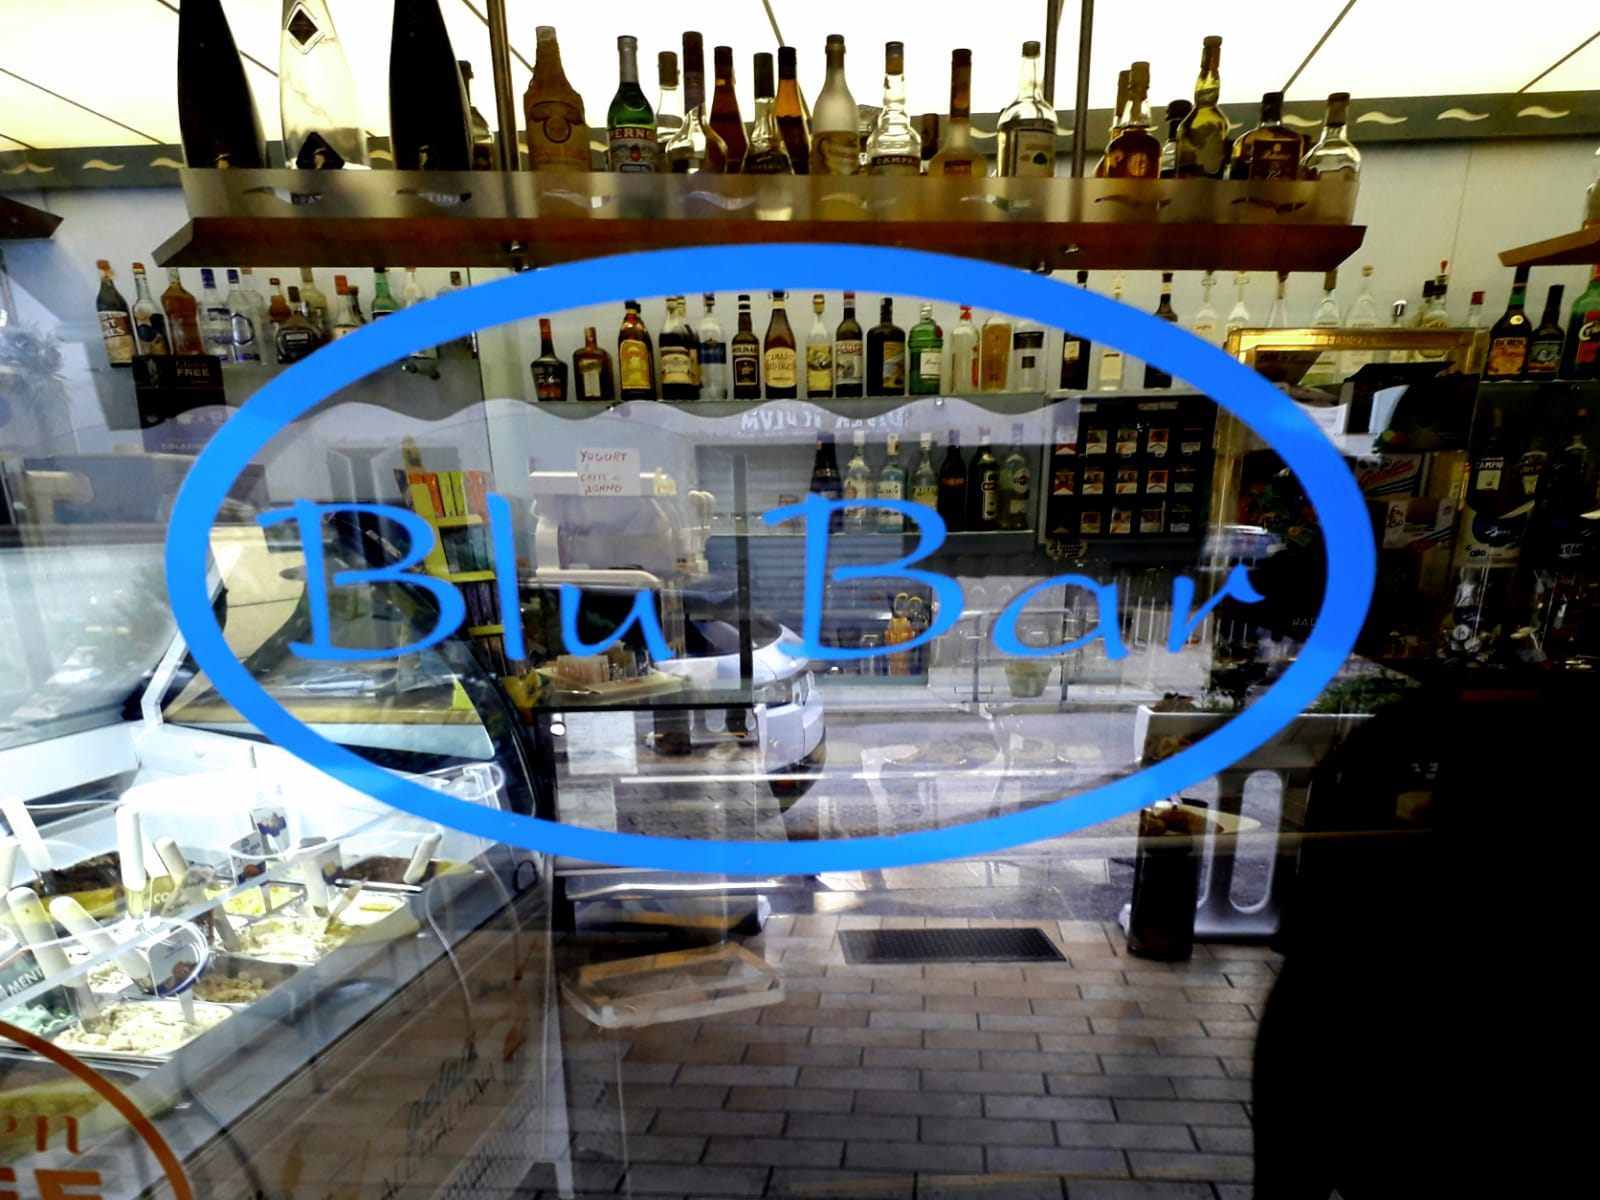 Blu Bar di Quattrini Anna & C. Snc